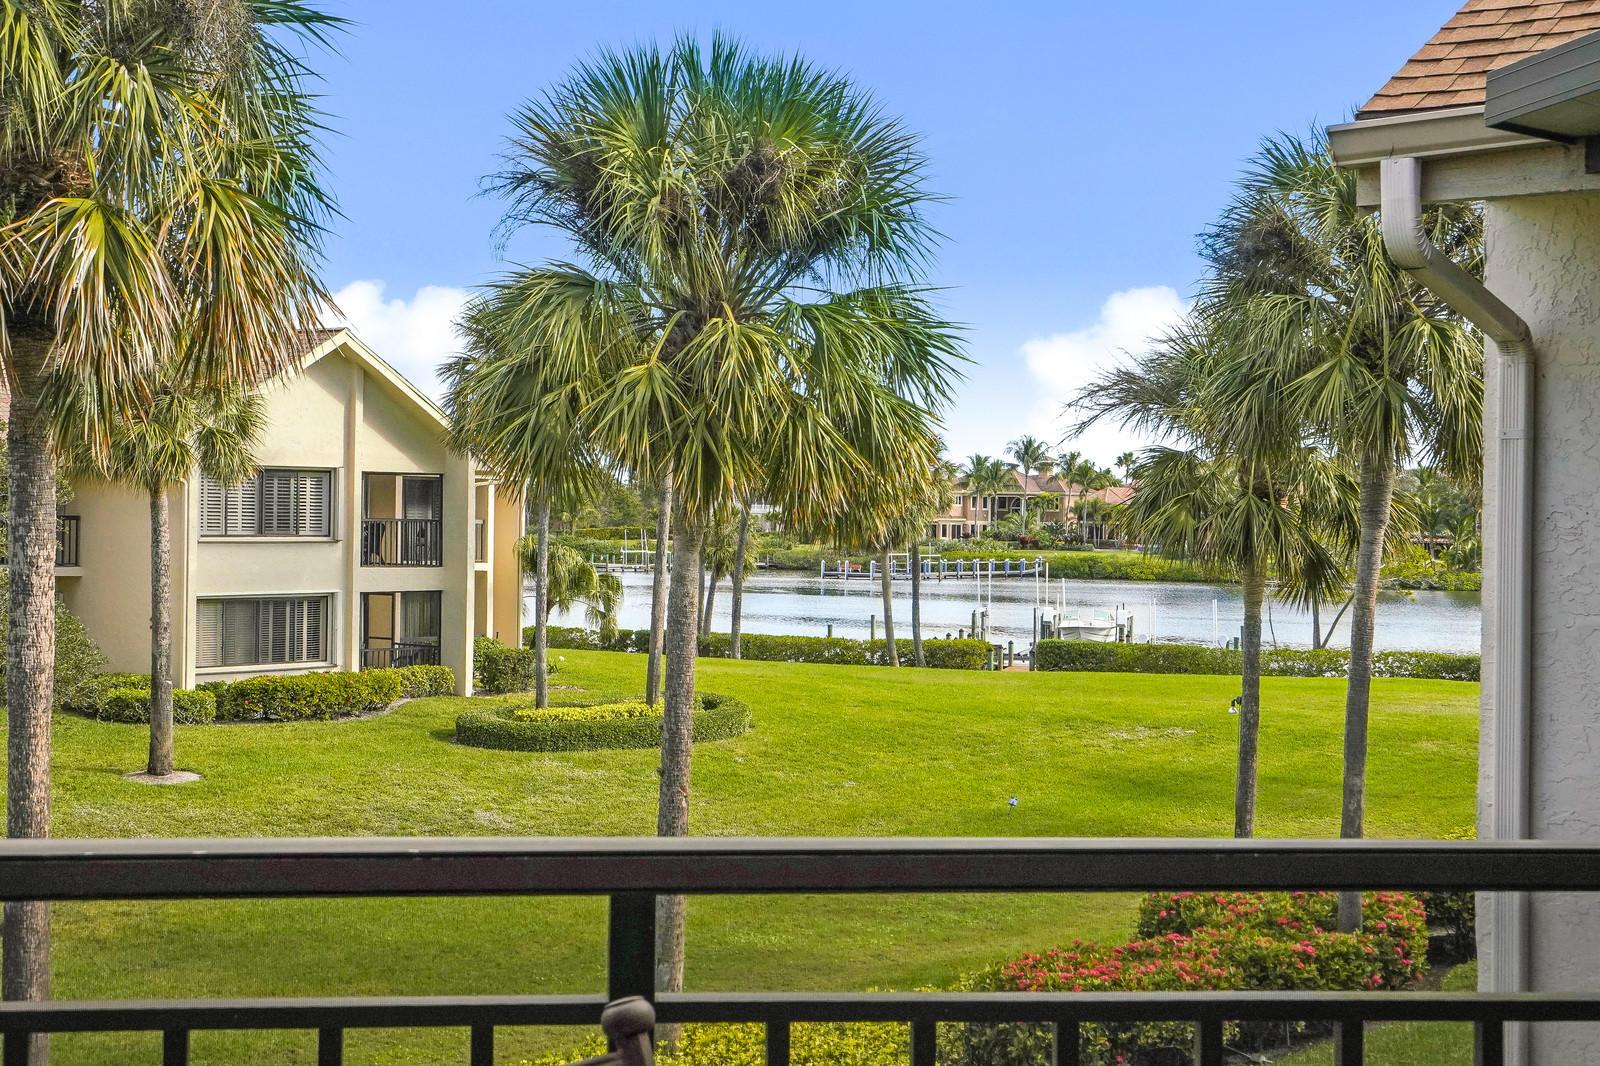 10411 Terrapin Place C -201, Tequesta, Florida 33469, 3 Bedrooms Bedrooms, ,3 BathroomsBathrooms,A,Condominium,Terrapin,RX-10492052